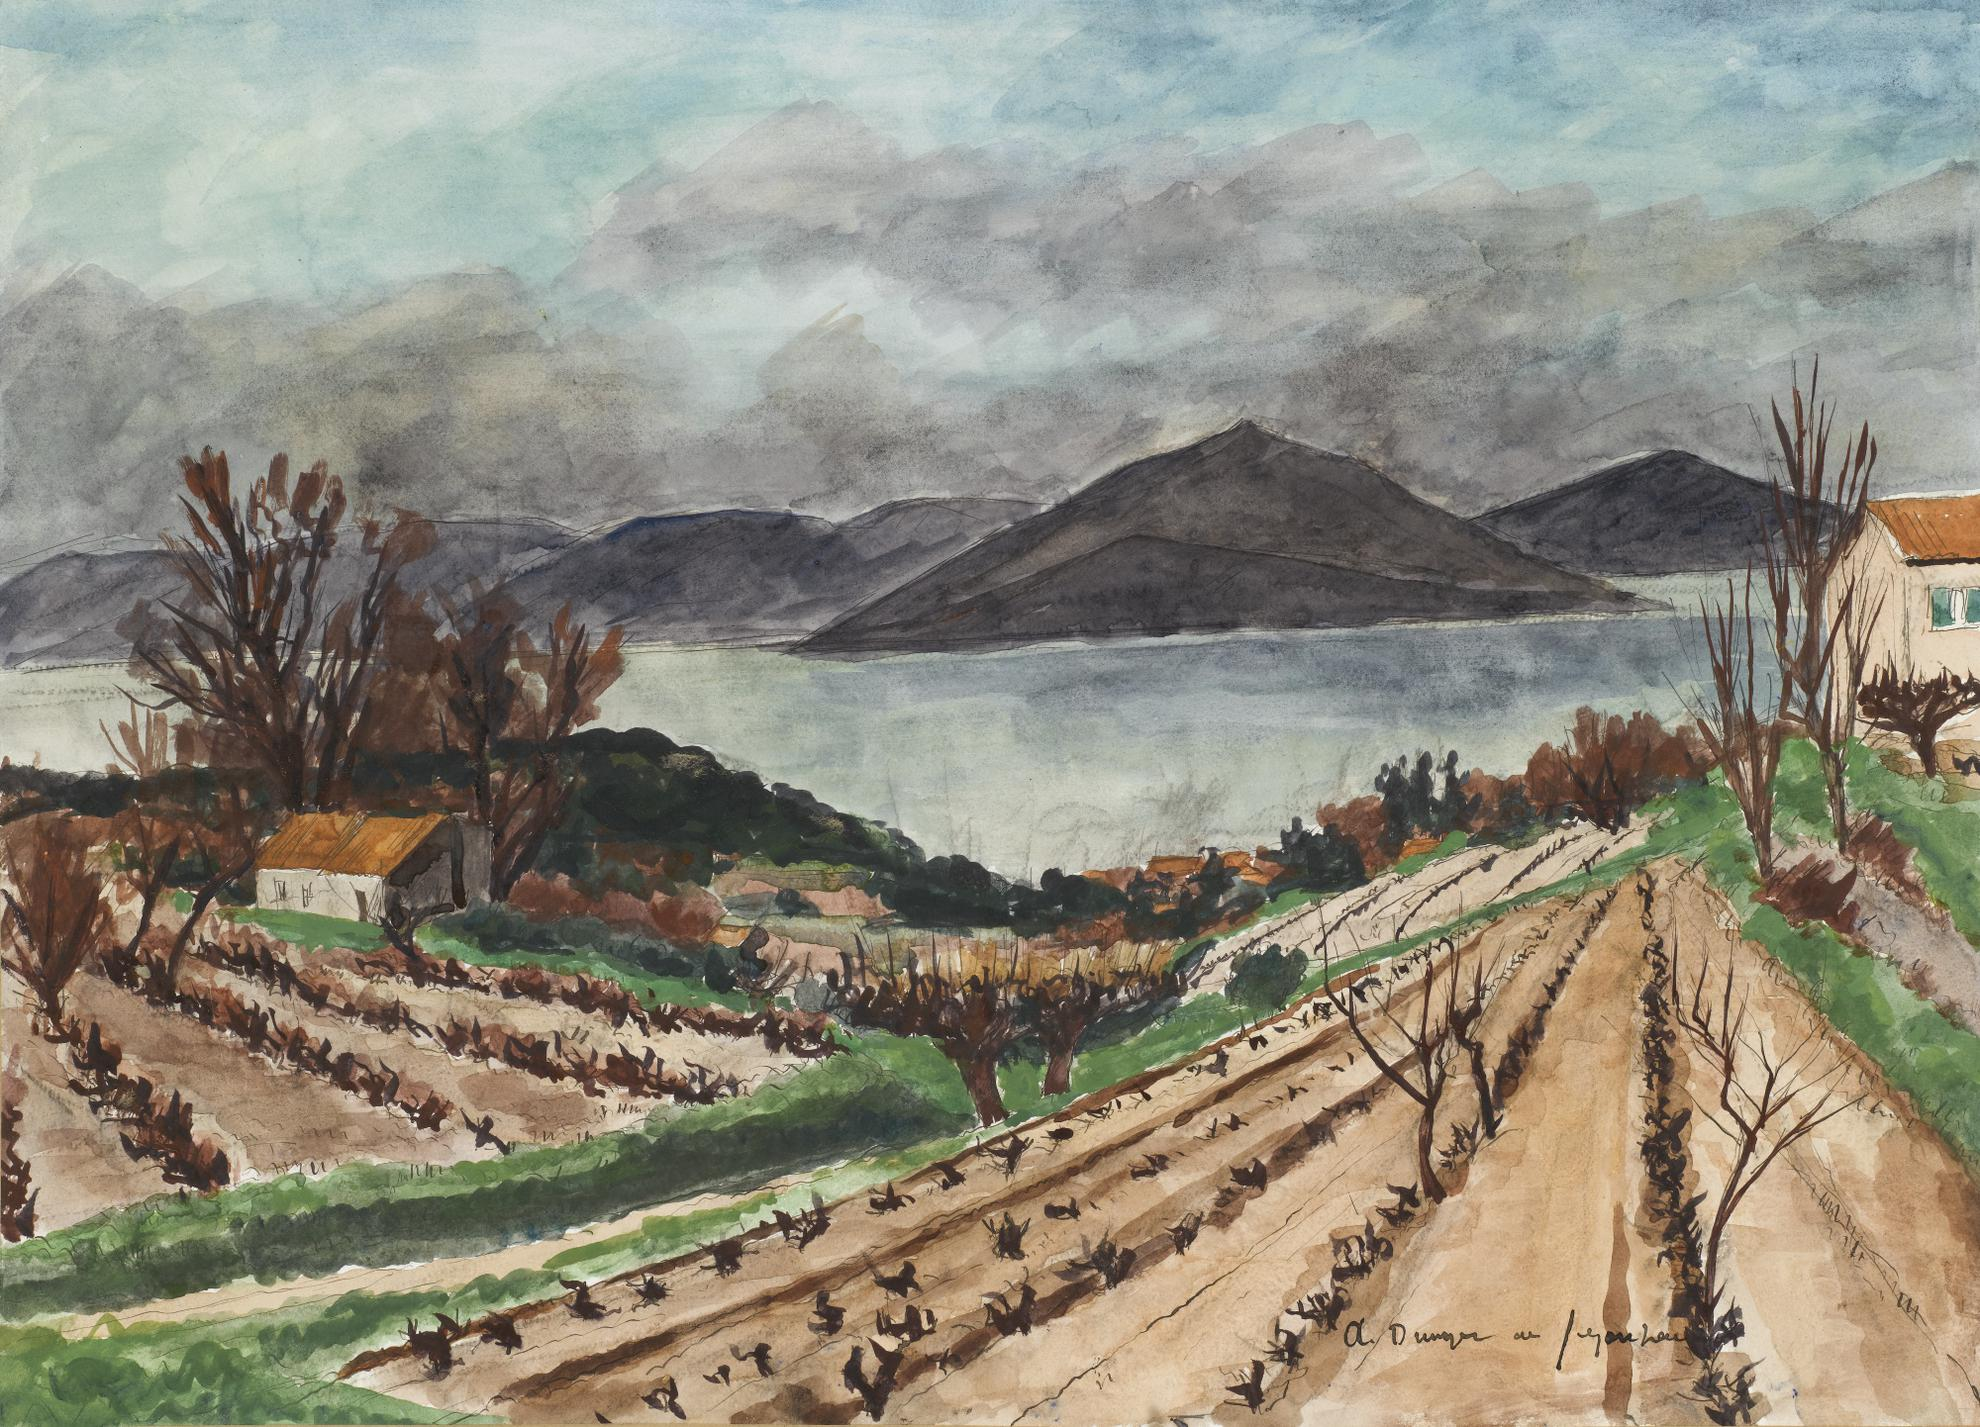 Andre Dunoyer de Segonzac-La Baie De St Tropez-1929